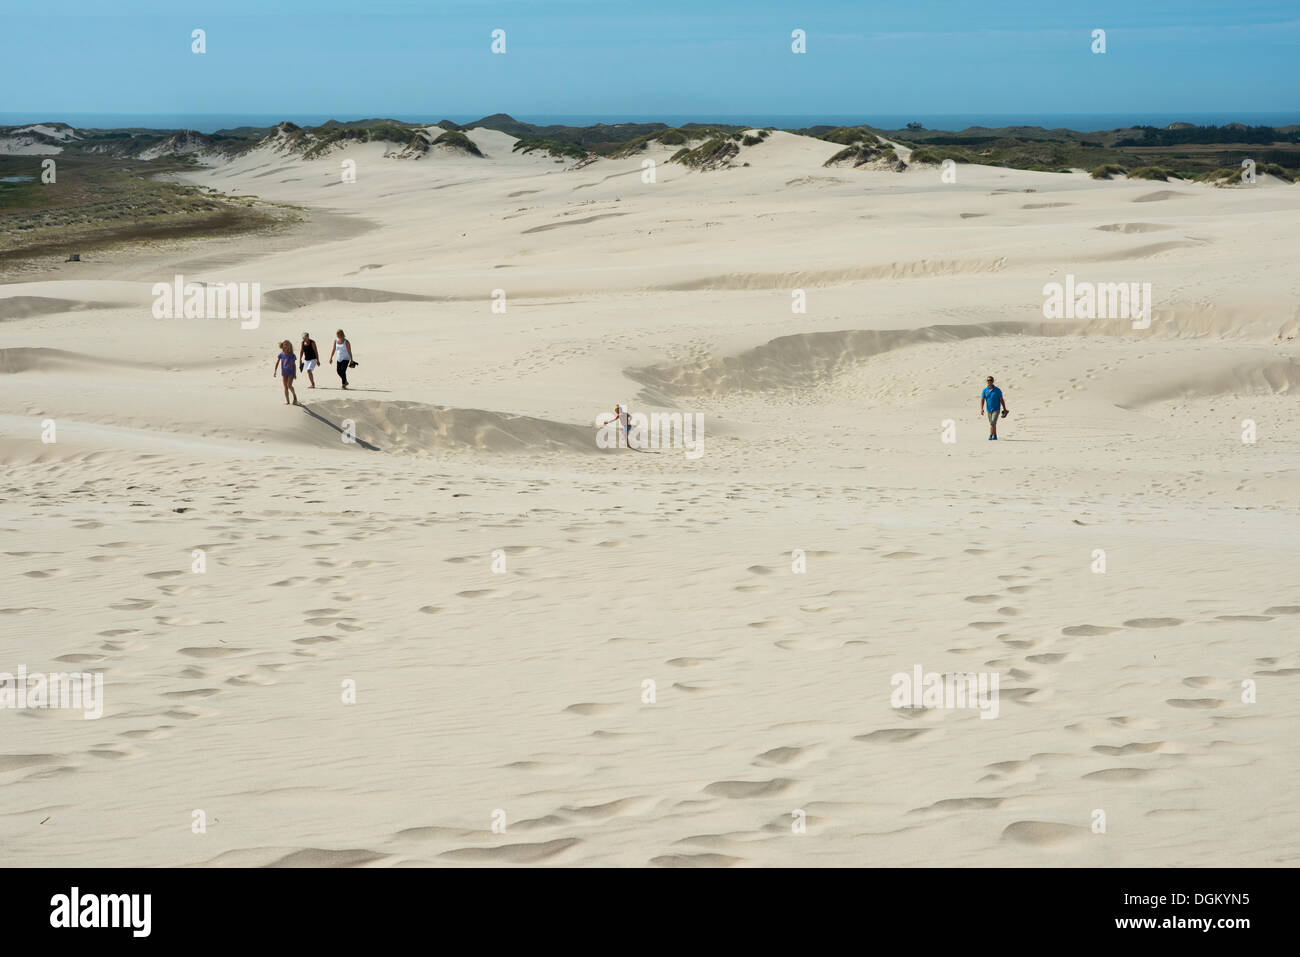 Touristen Flanieren auf der wandernden Düne Råbjerg Mile, Kandestederne, Region Nordjylland, Jütland, Dänemark Stockbild